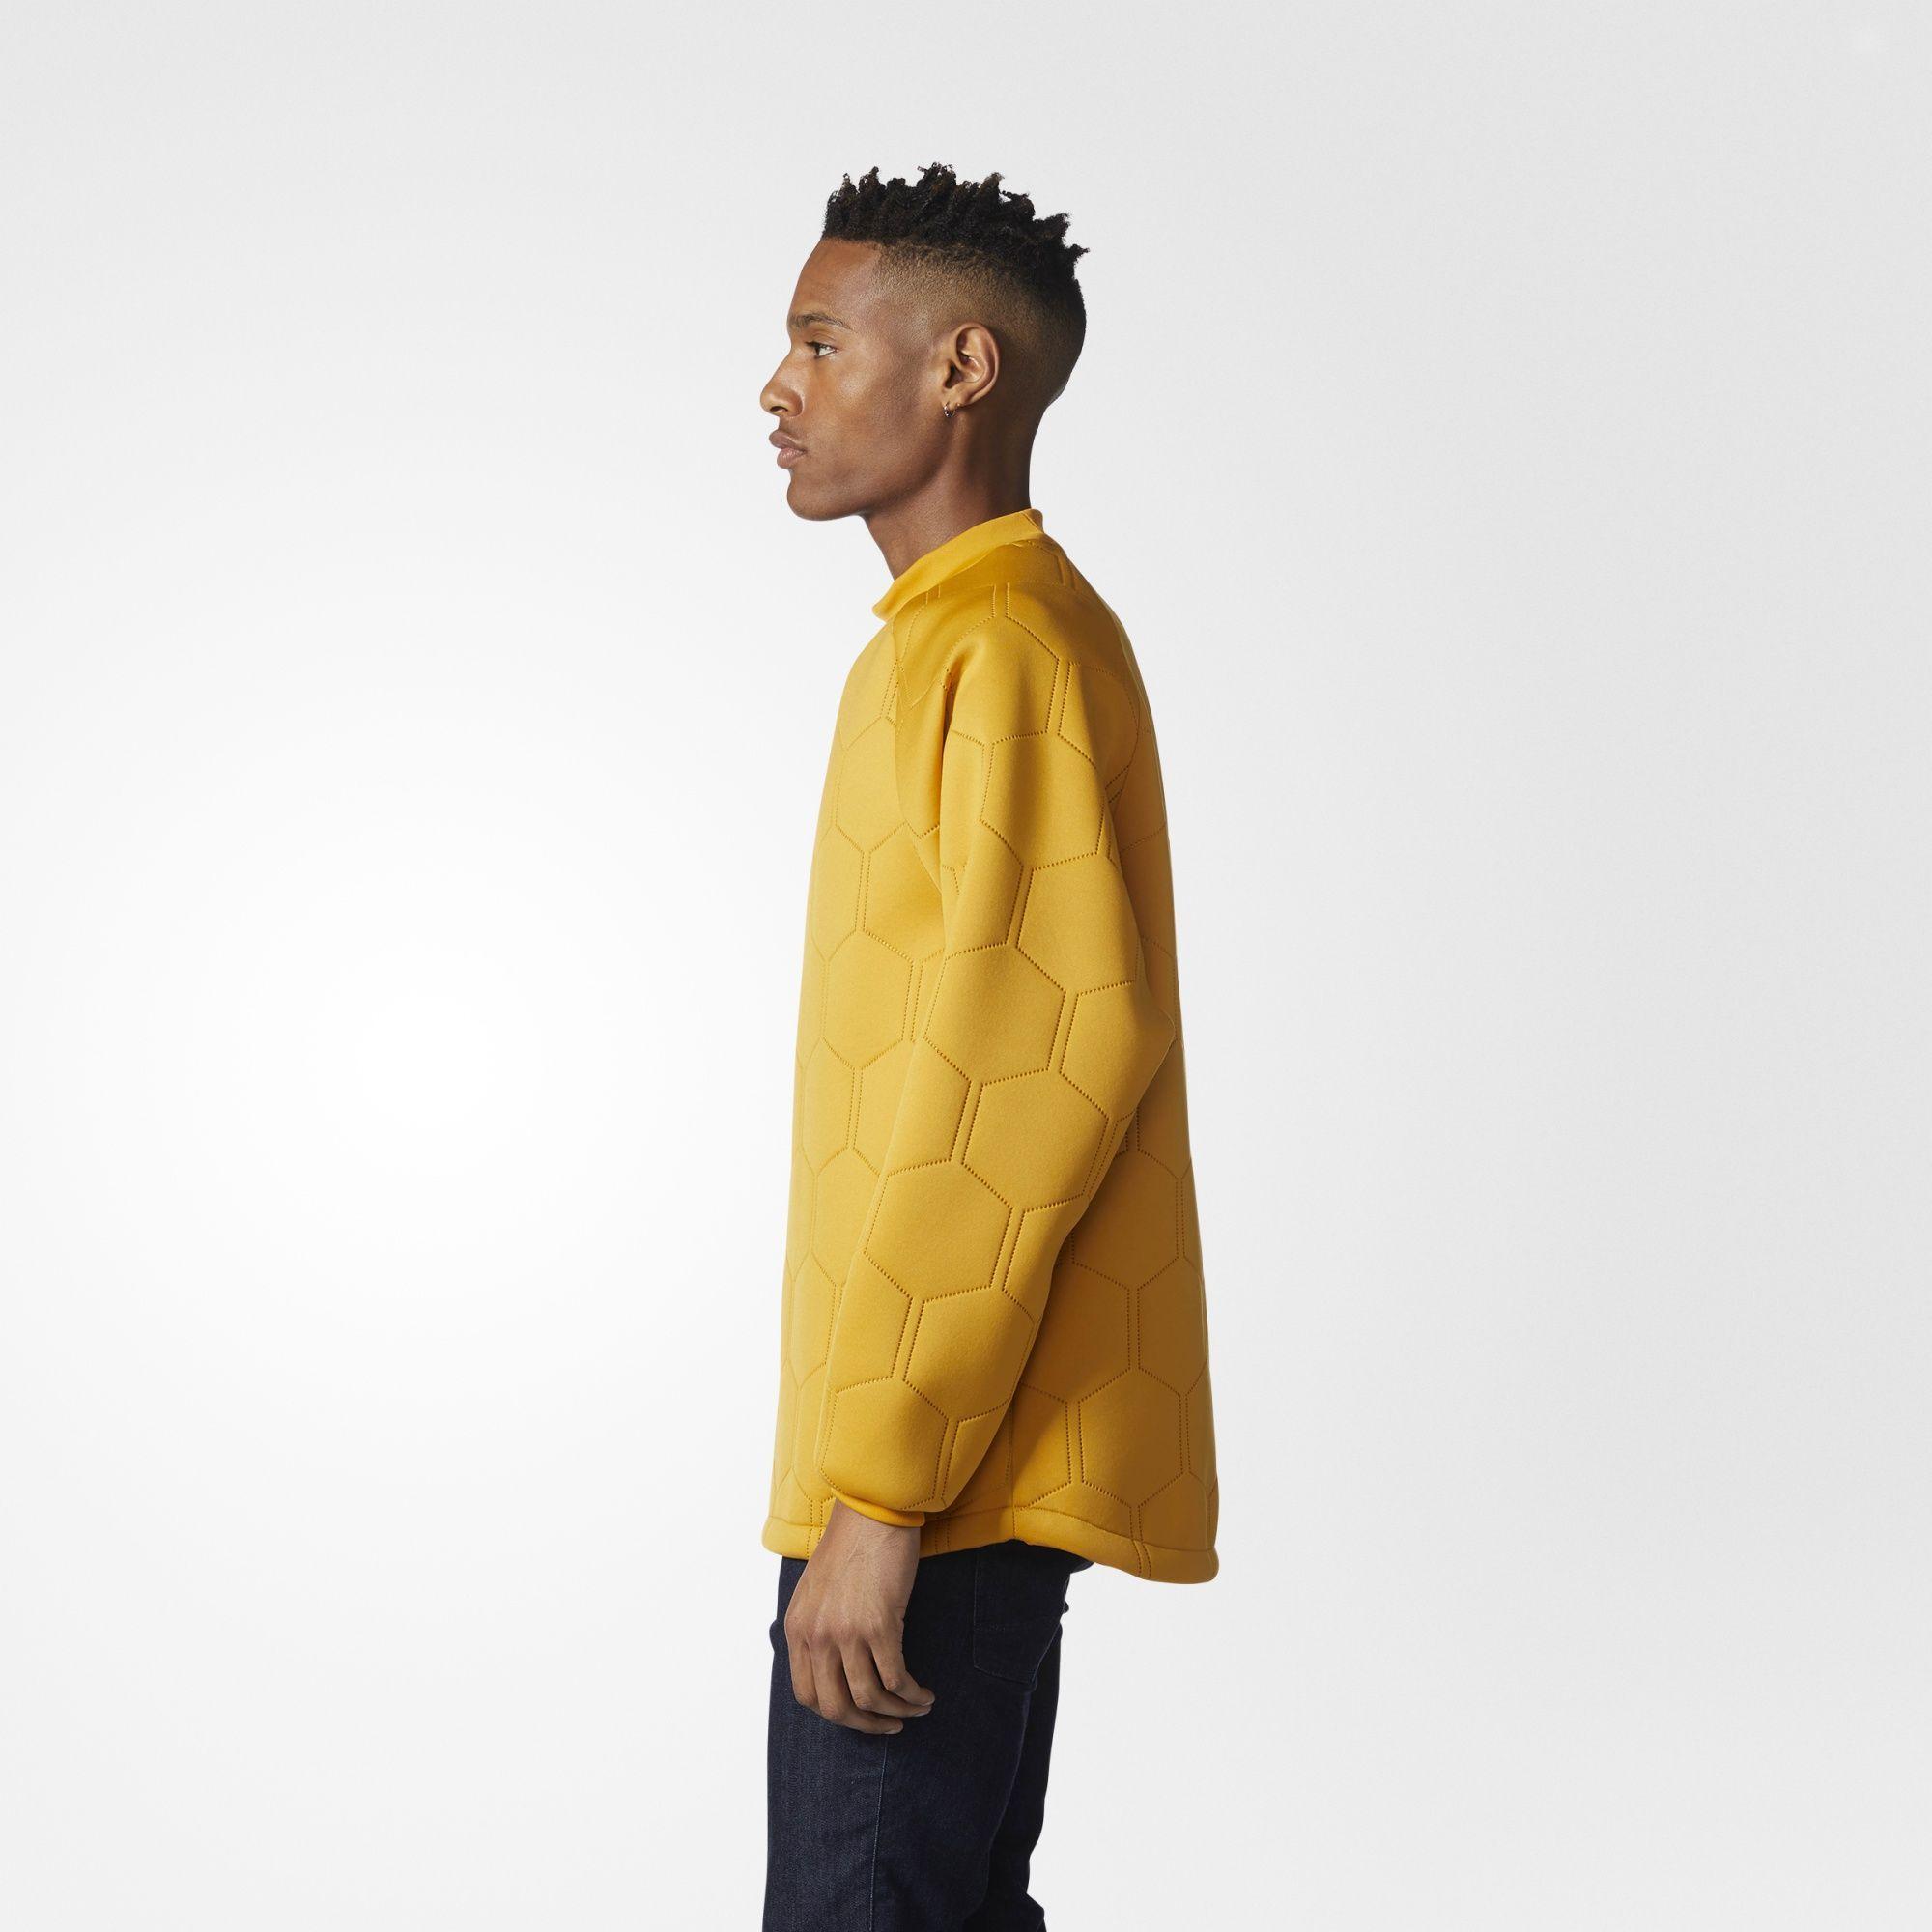 b8c3852517 adidas - Sonic Soccer Sweatshirt   Men's Fashion   Sweatshirts ...